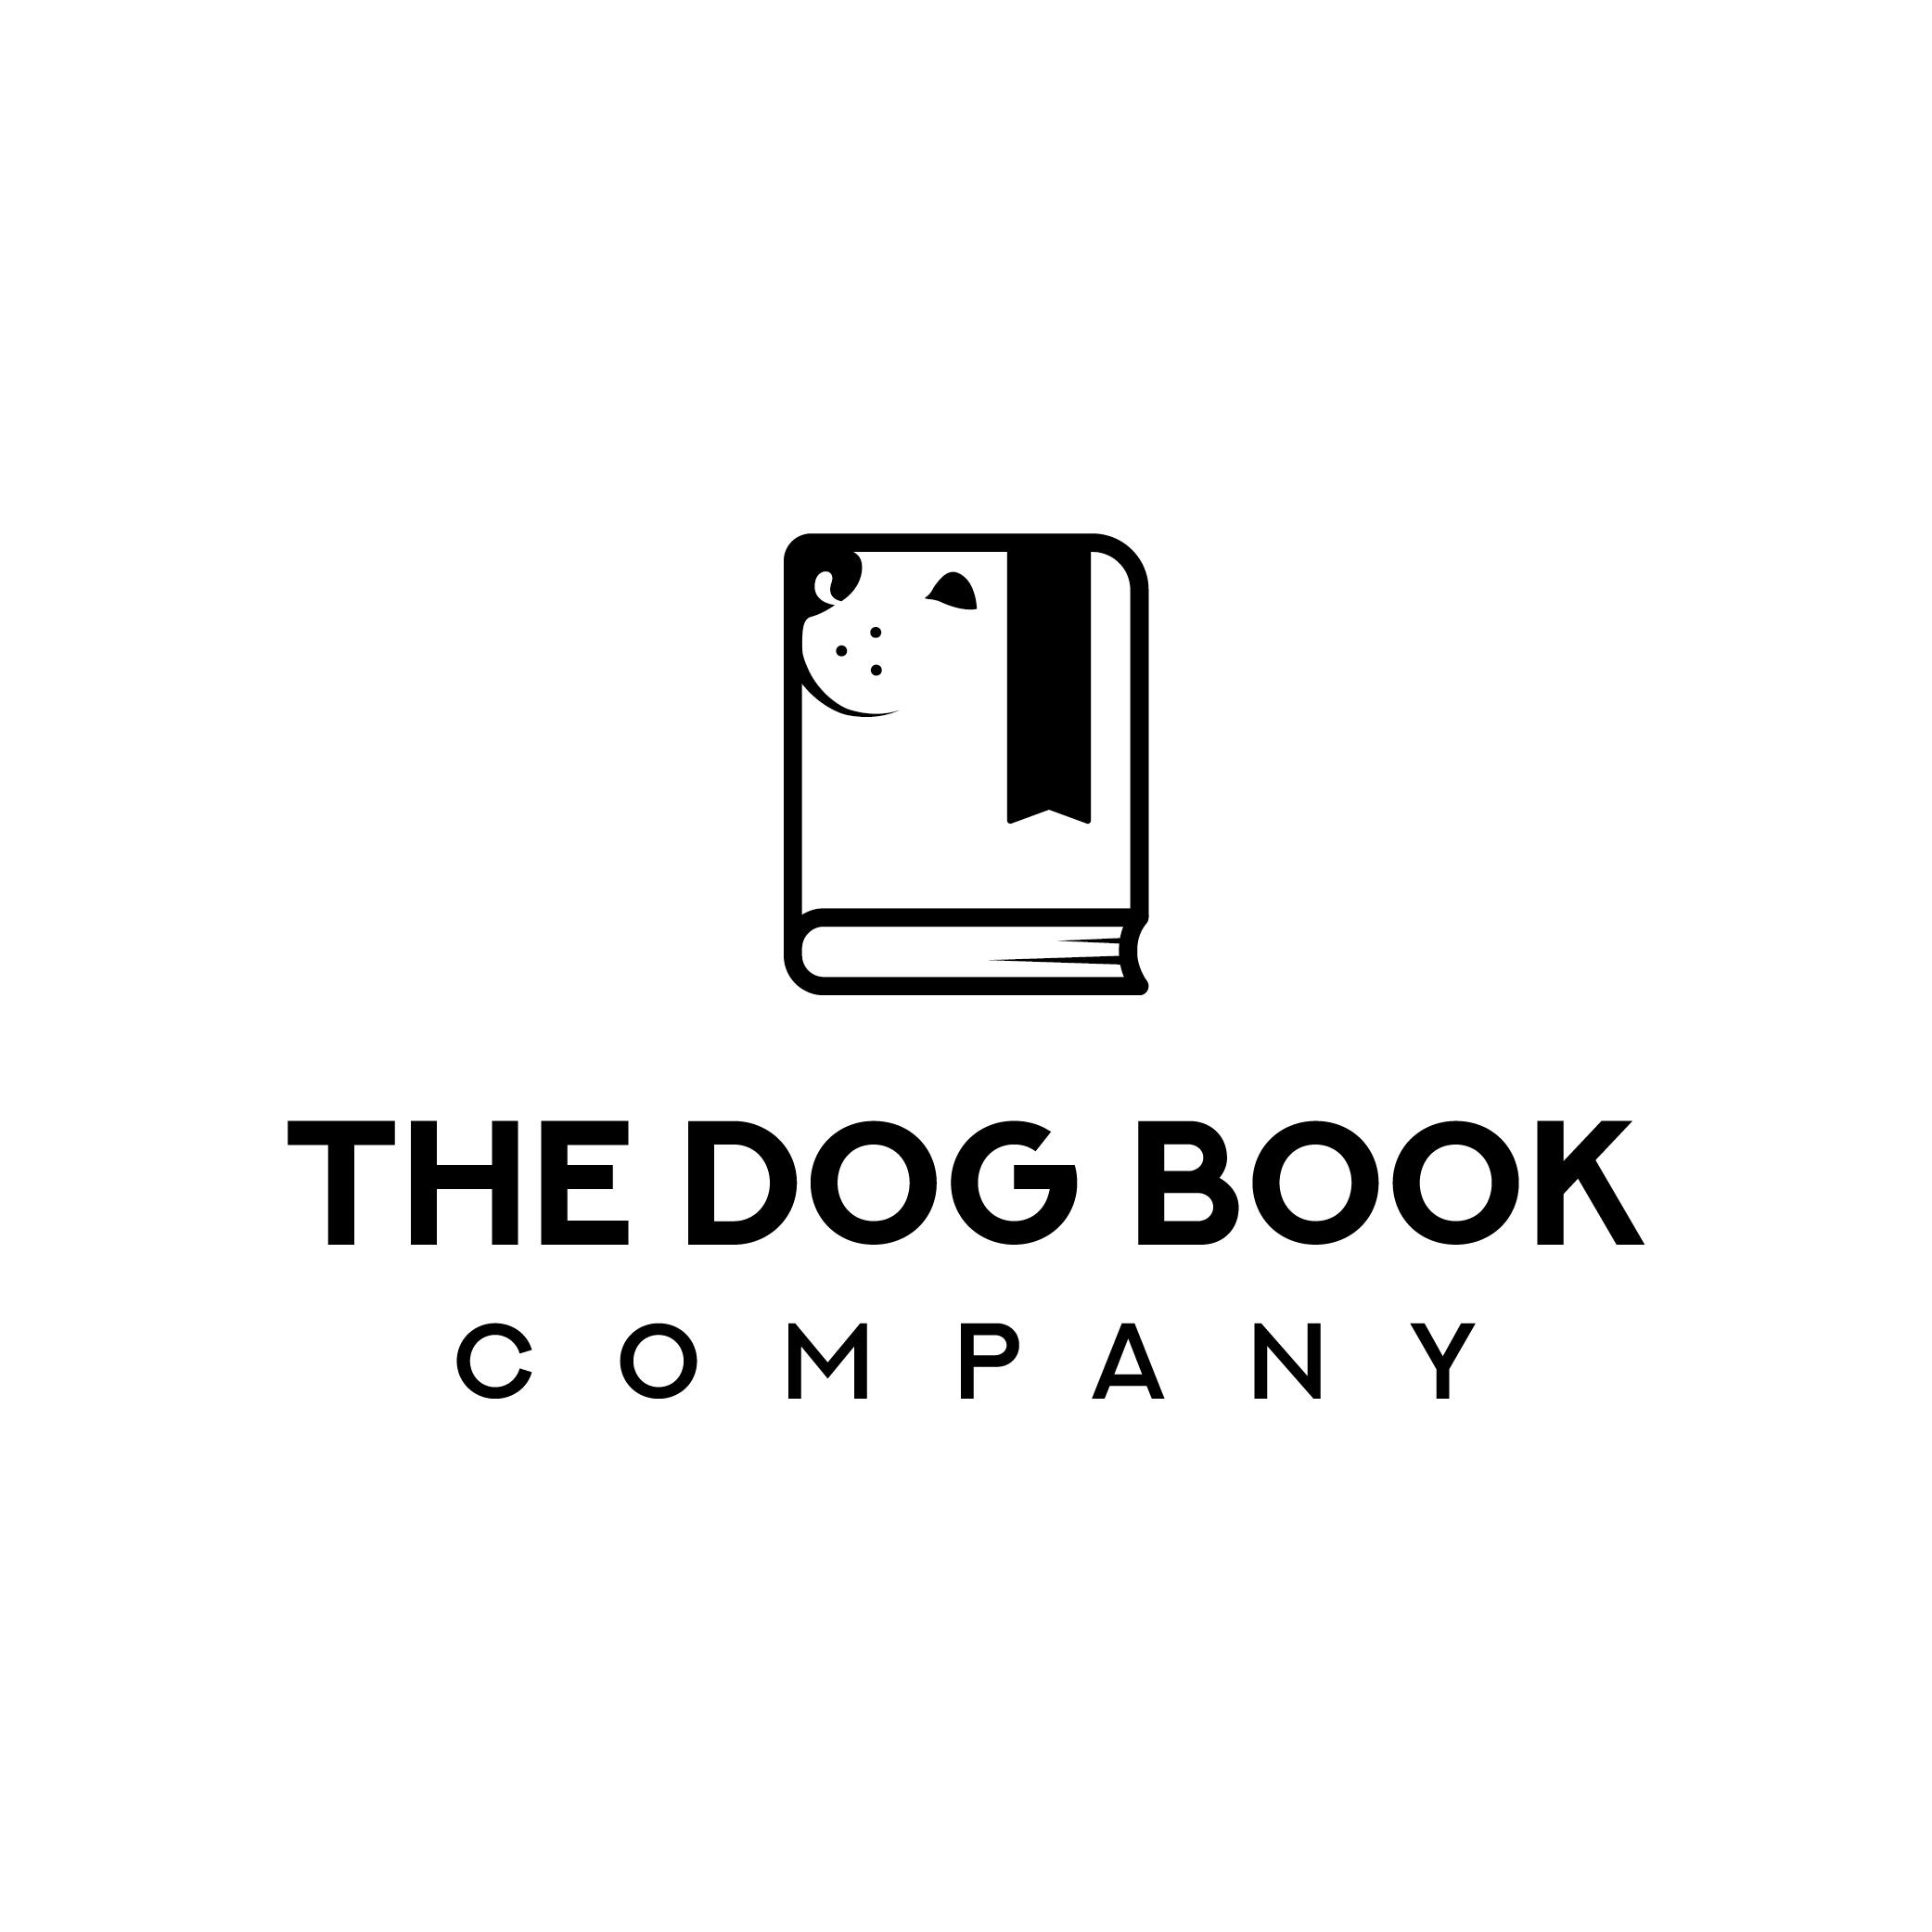 The Dog Book Company